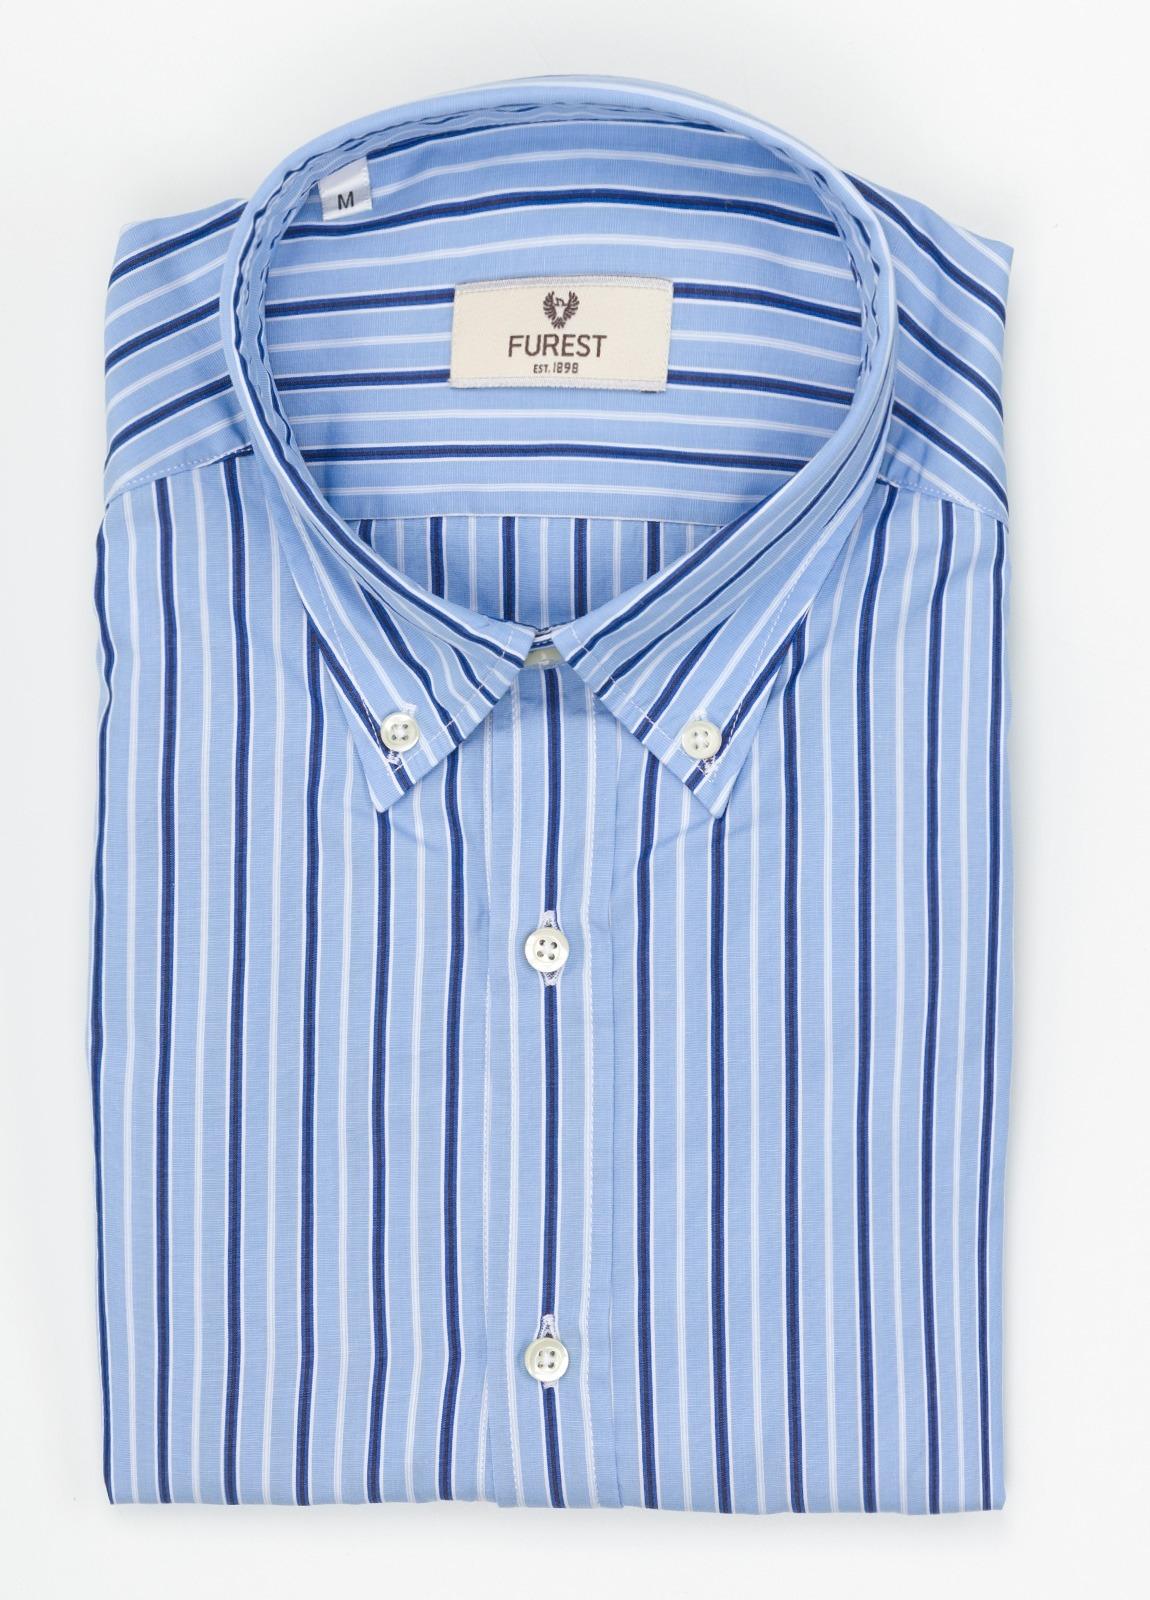 Camisa Leisure Wear SLIM FIT Modelo BOTTON DOWN color azul celeste, estampado rayas azul. 100% Algodón.